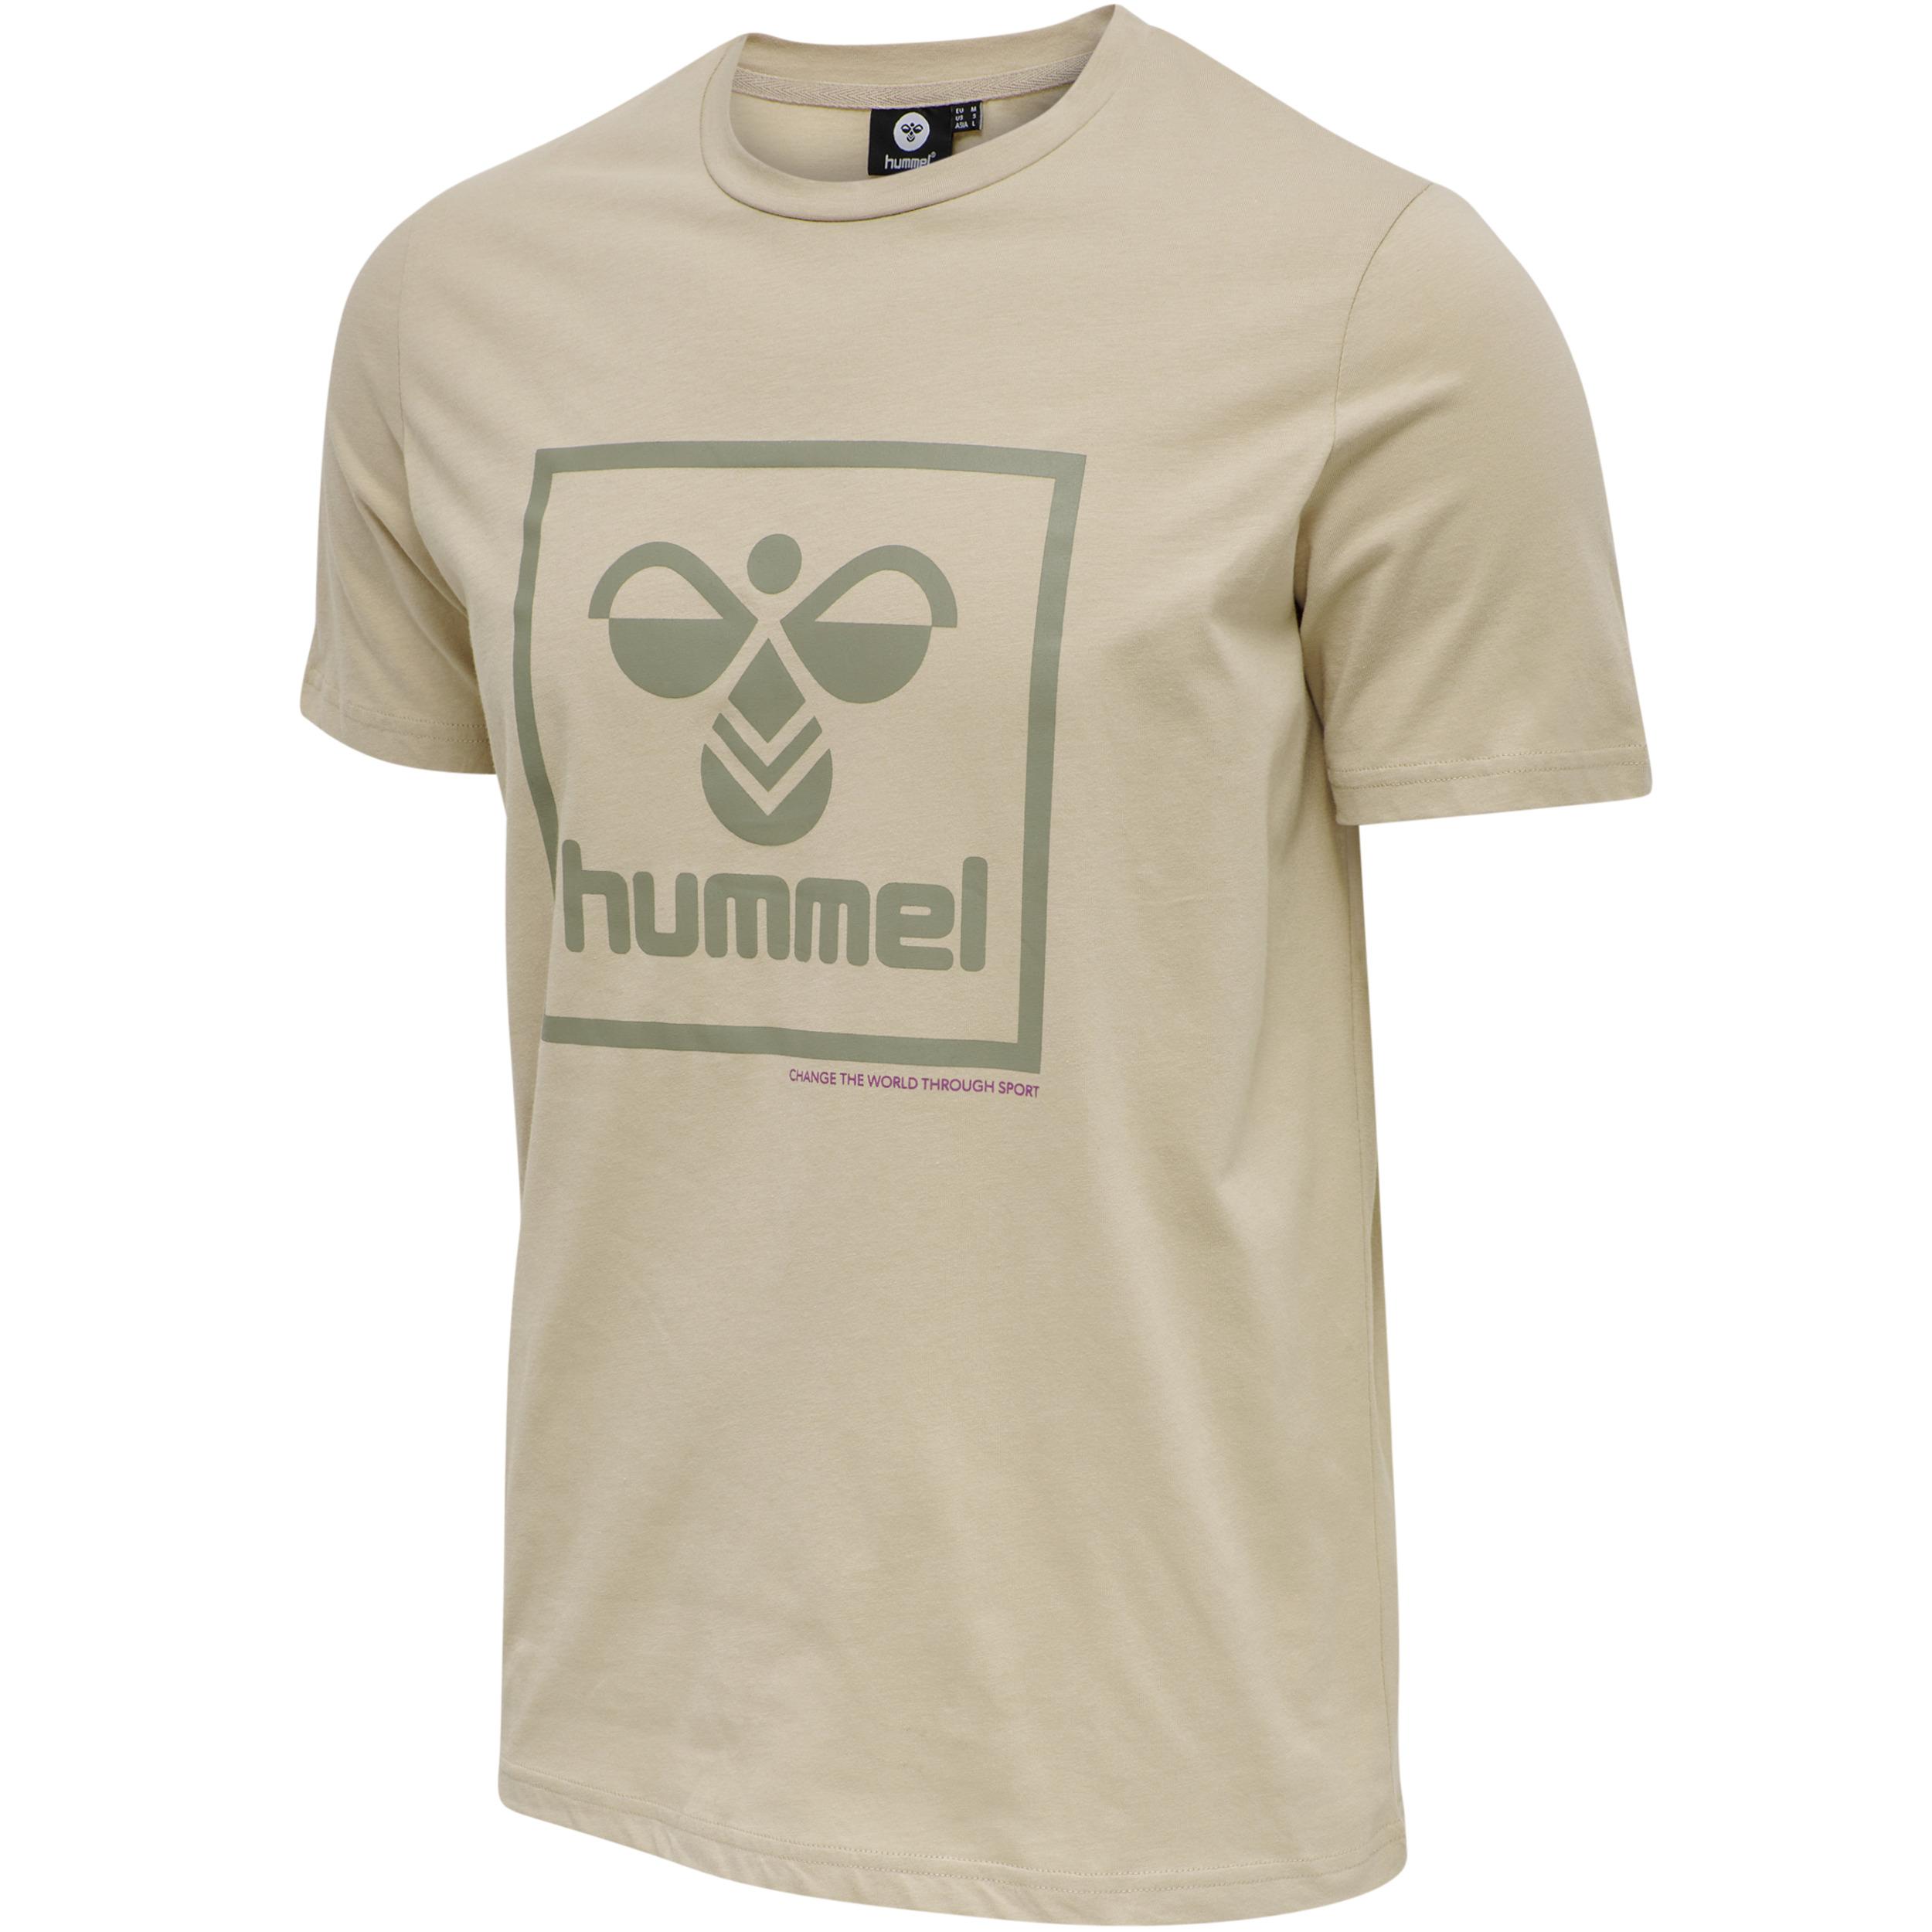 Hummel Isam t-shirt